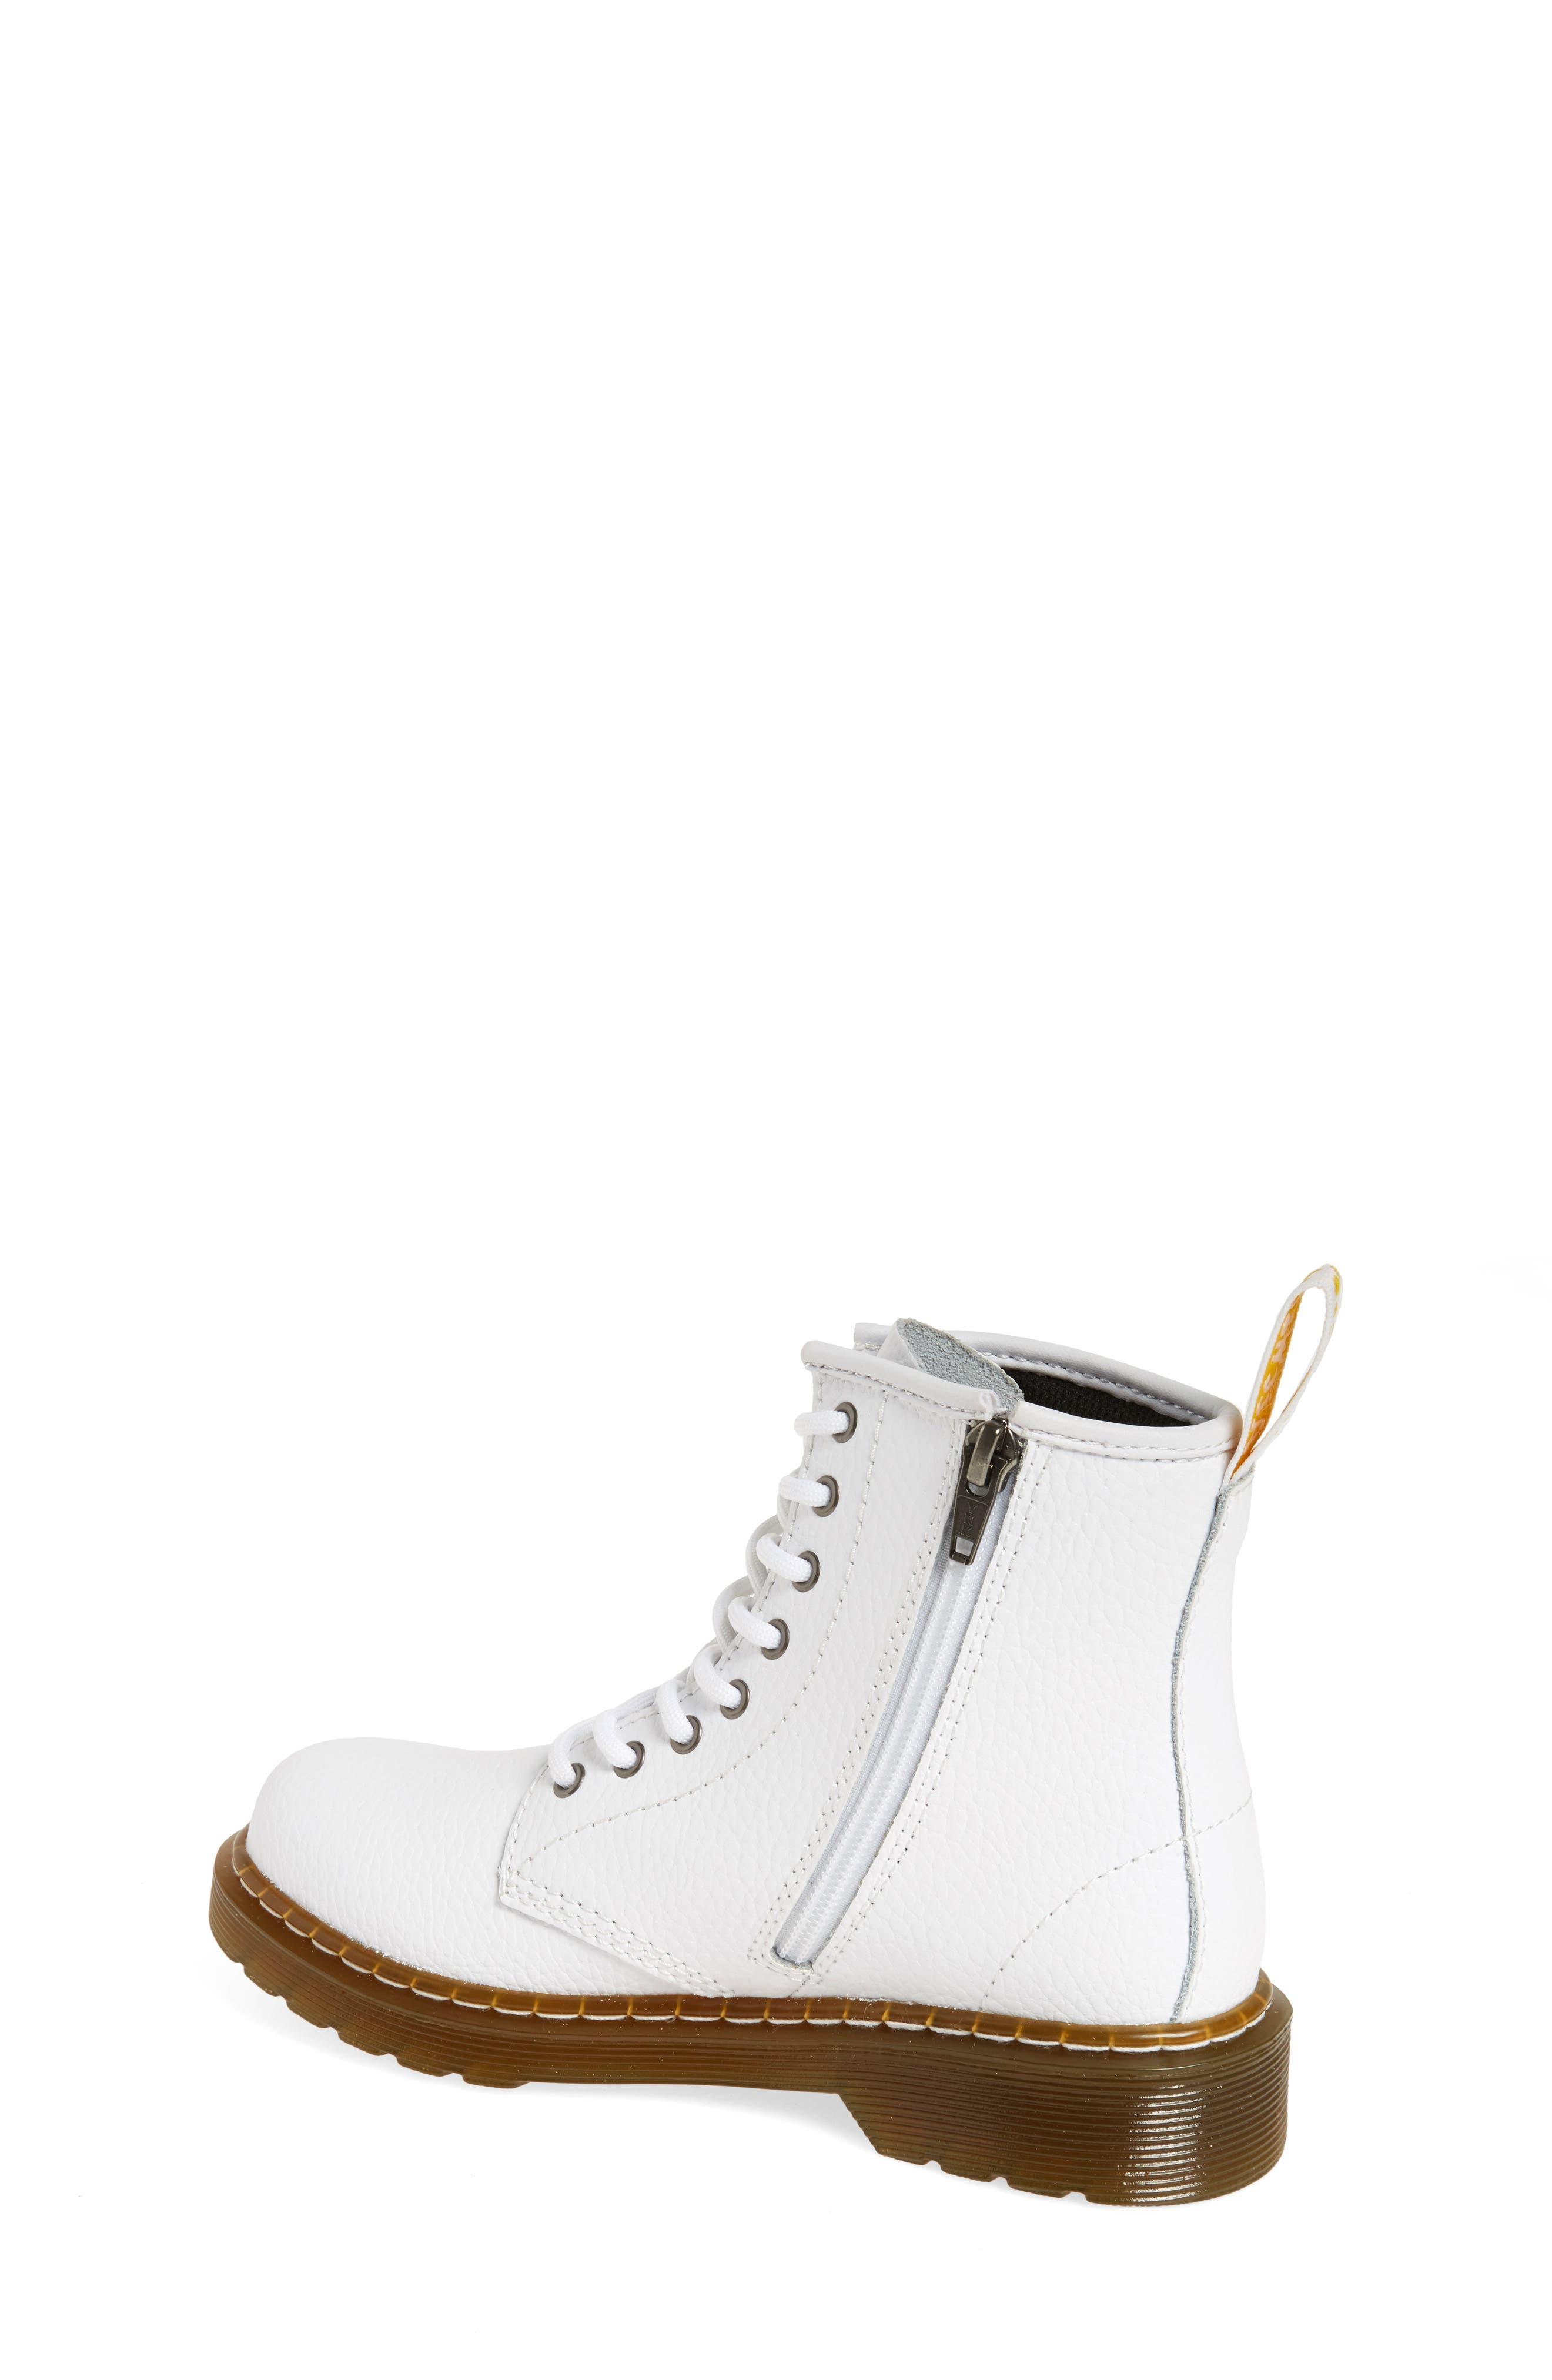 Delaney Pebbled Boot,                             Alternate thumbnail 2, color,                             White Pebble Leather